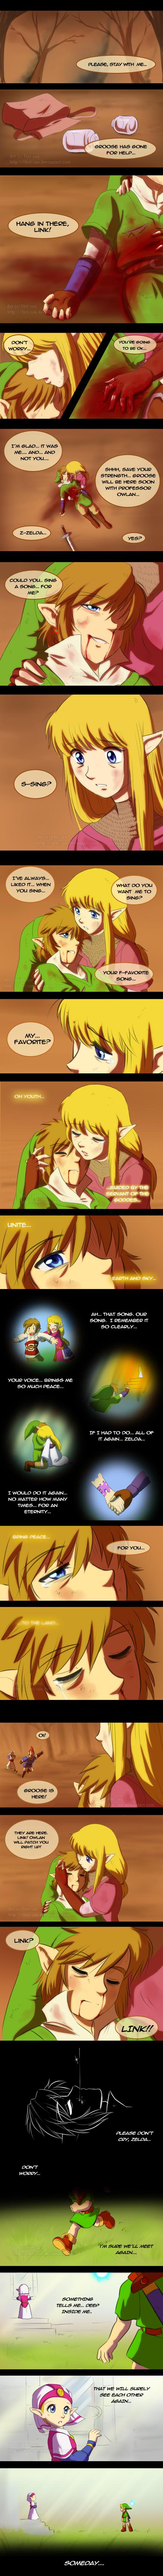 Legend of Zelda feels. Not mine but still amazing and makes me cry. Legend of Zelda feels Not mine but still amazing and makes me cry